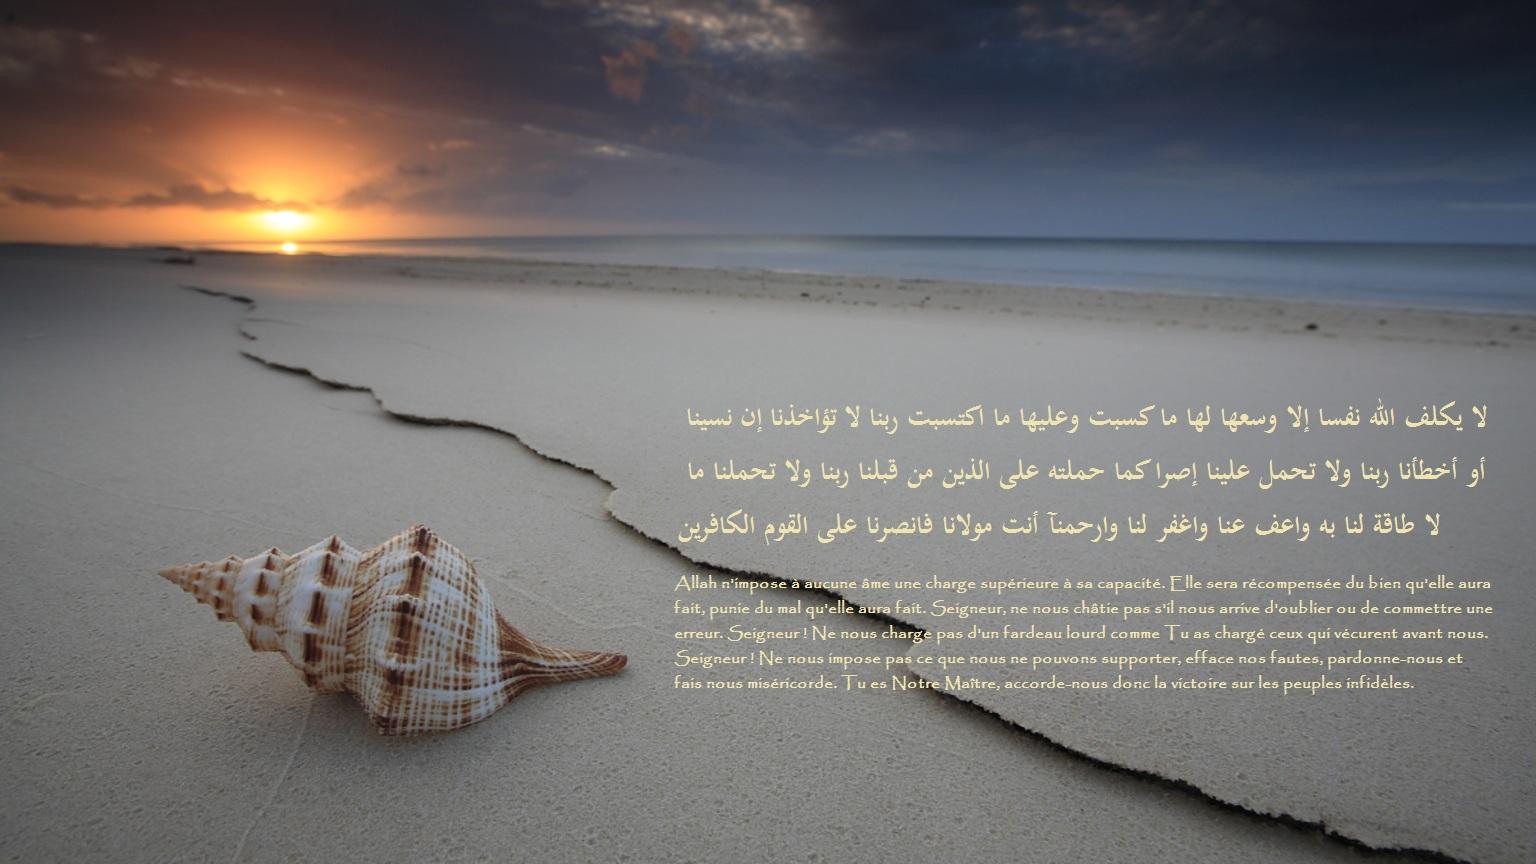 fond ecran islam - Page 6